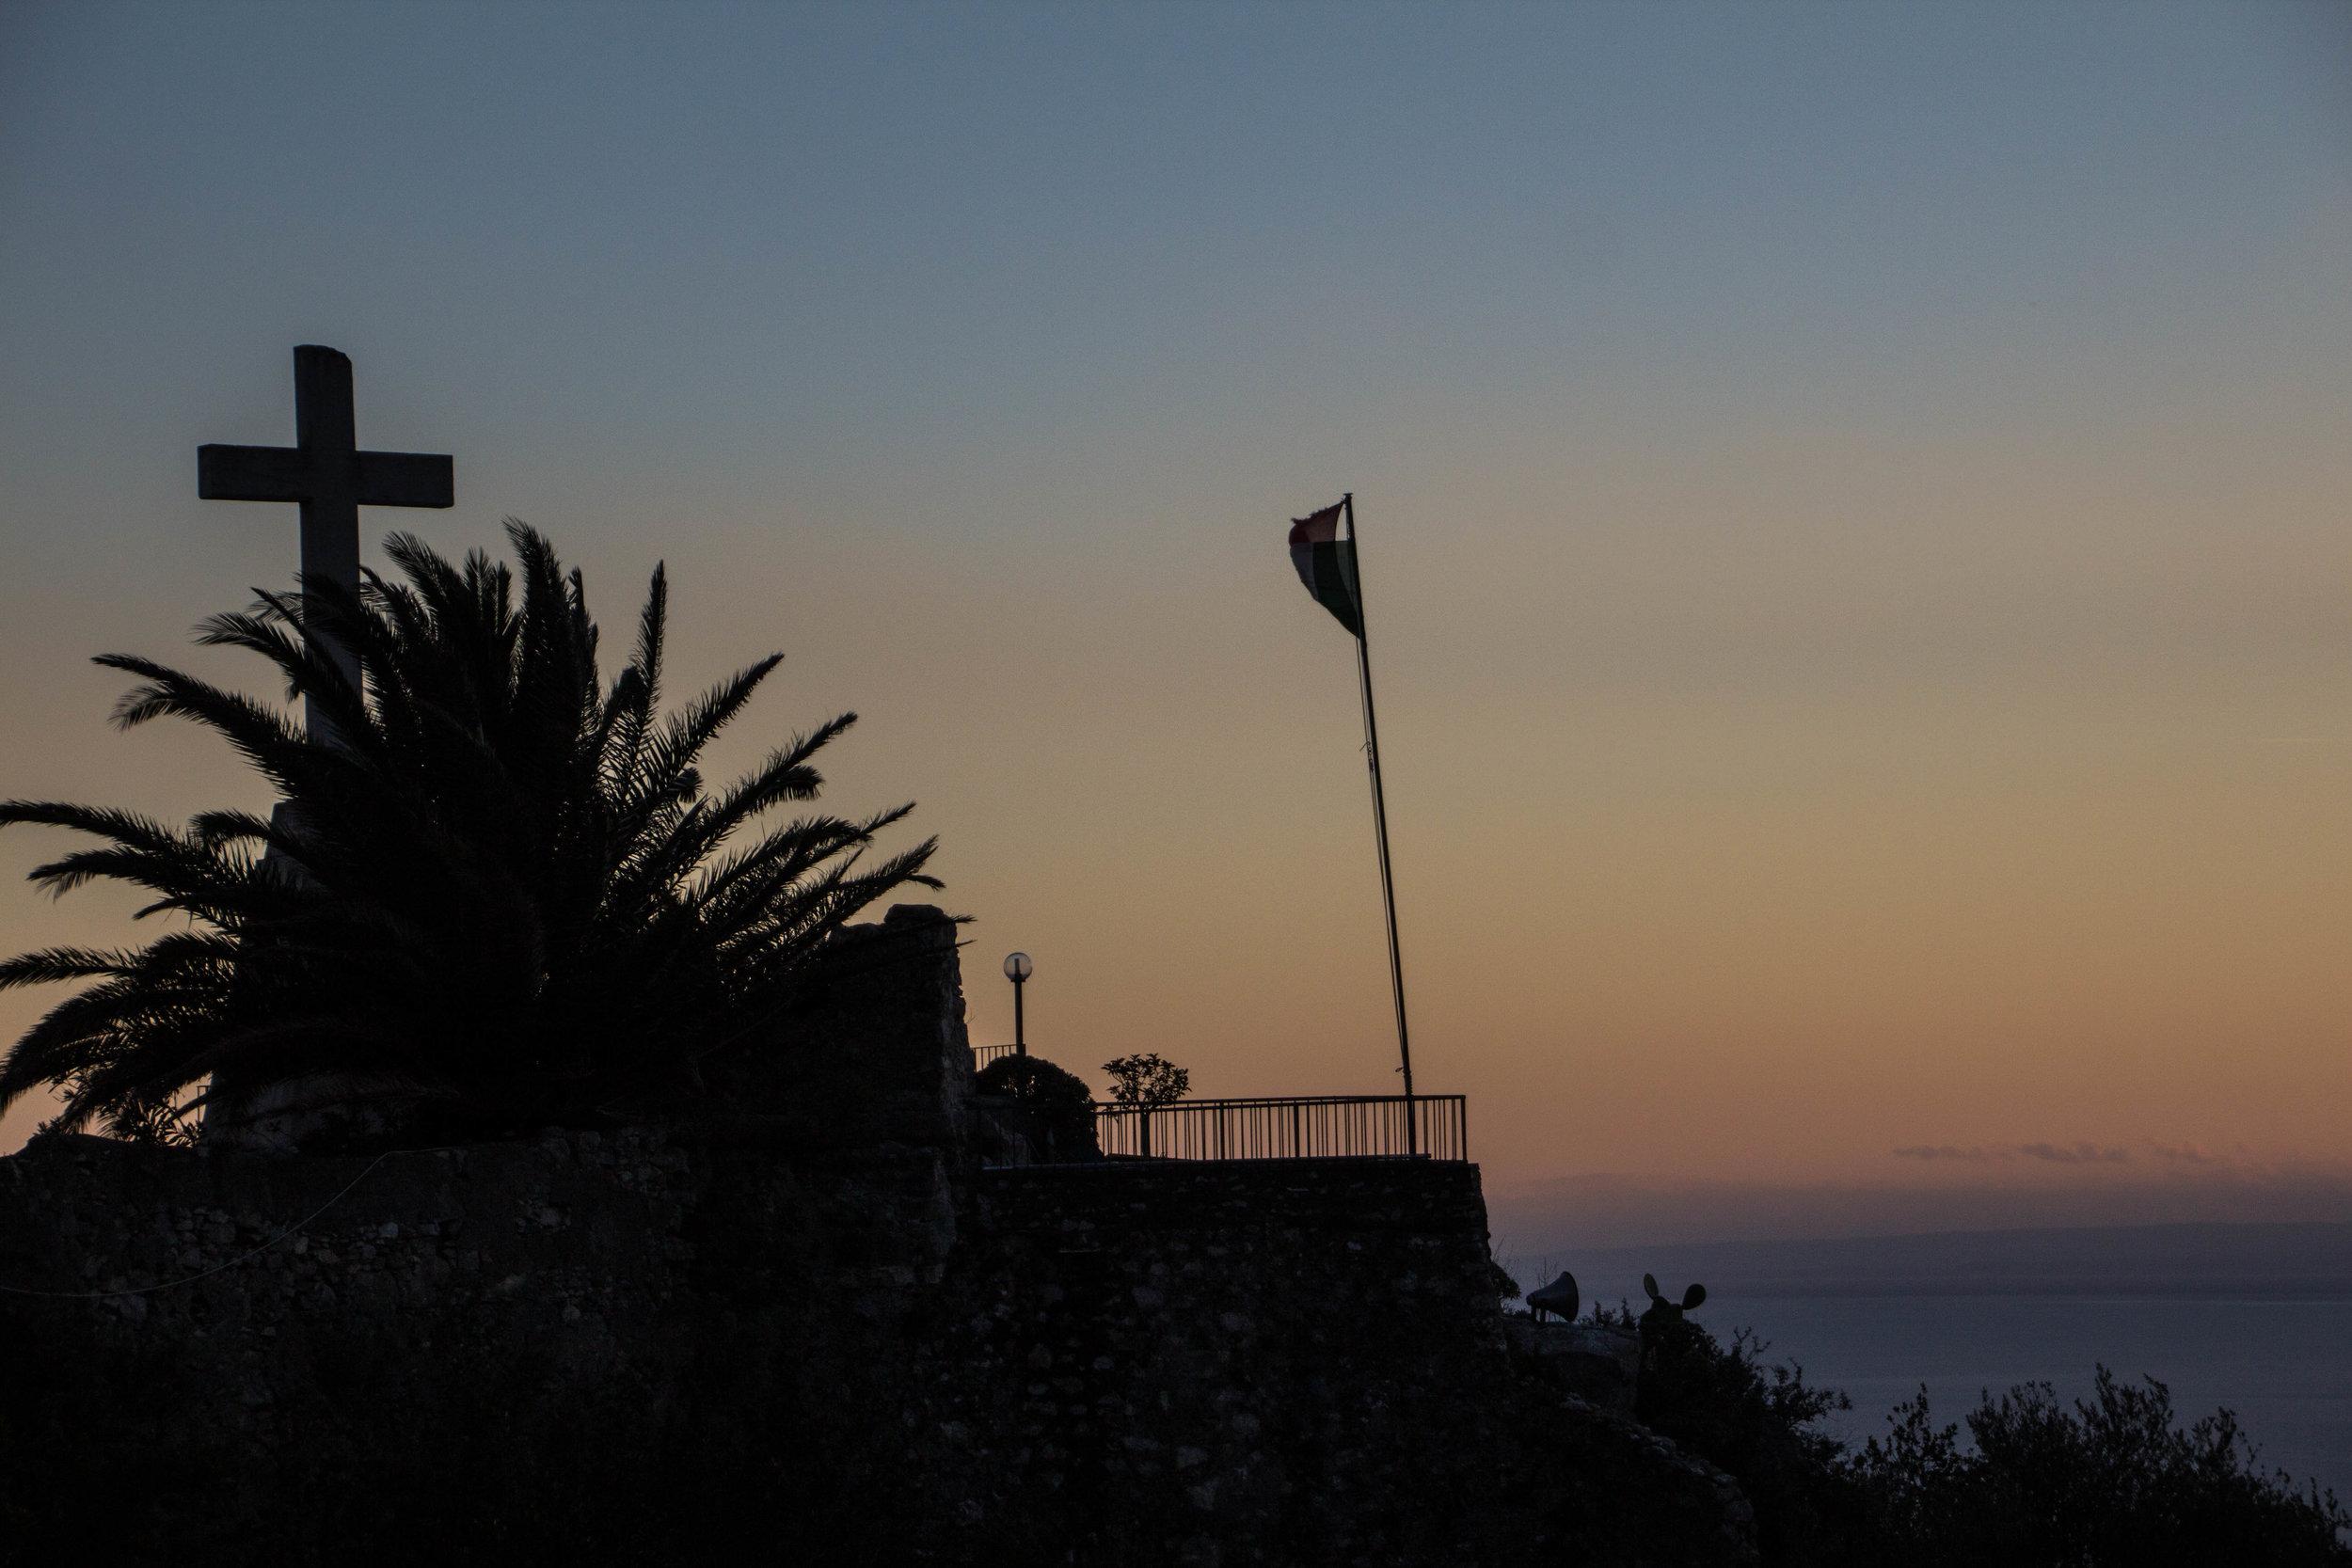 sunset-photography-taormina-sicily-10.jpg